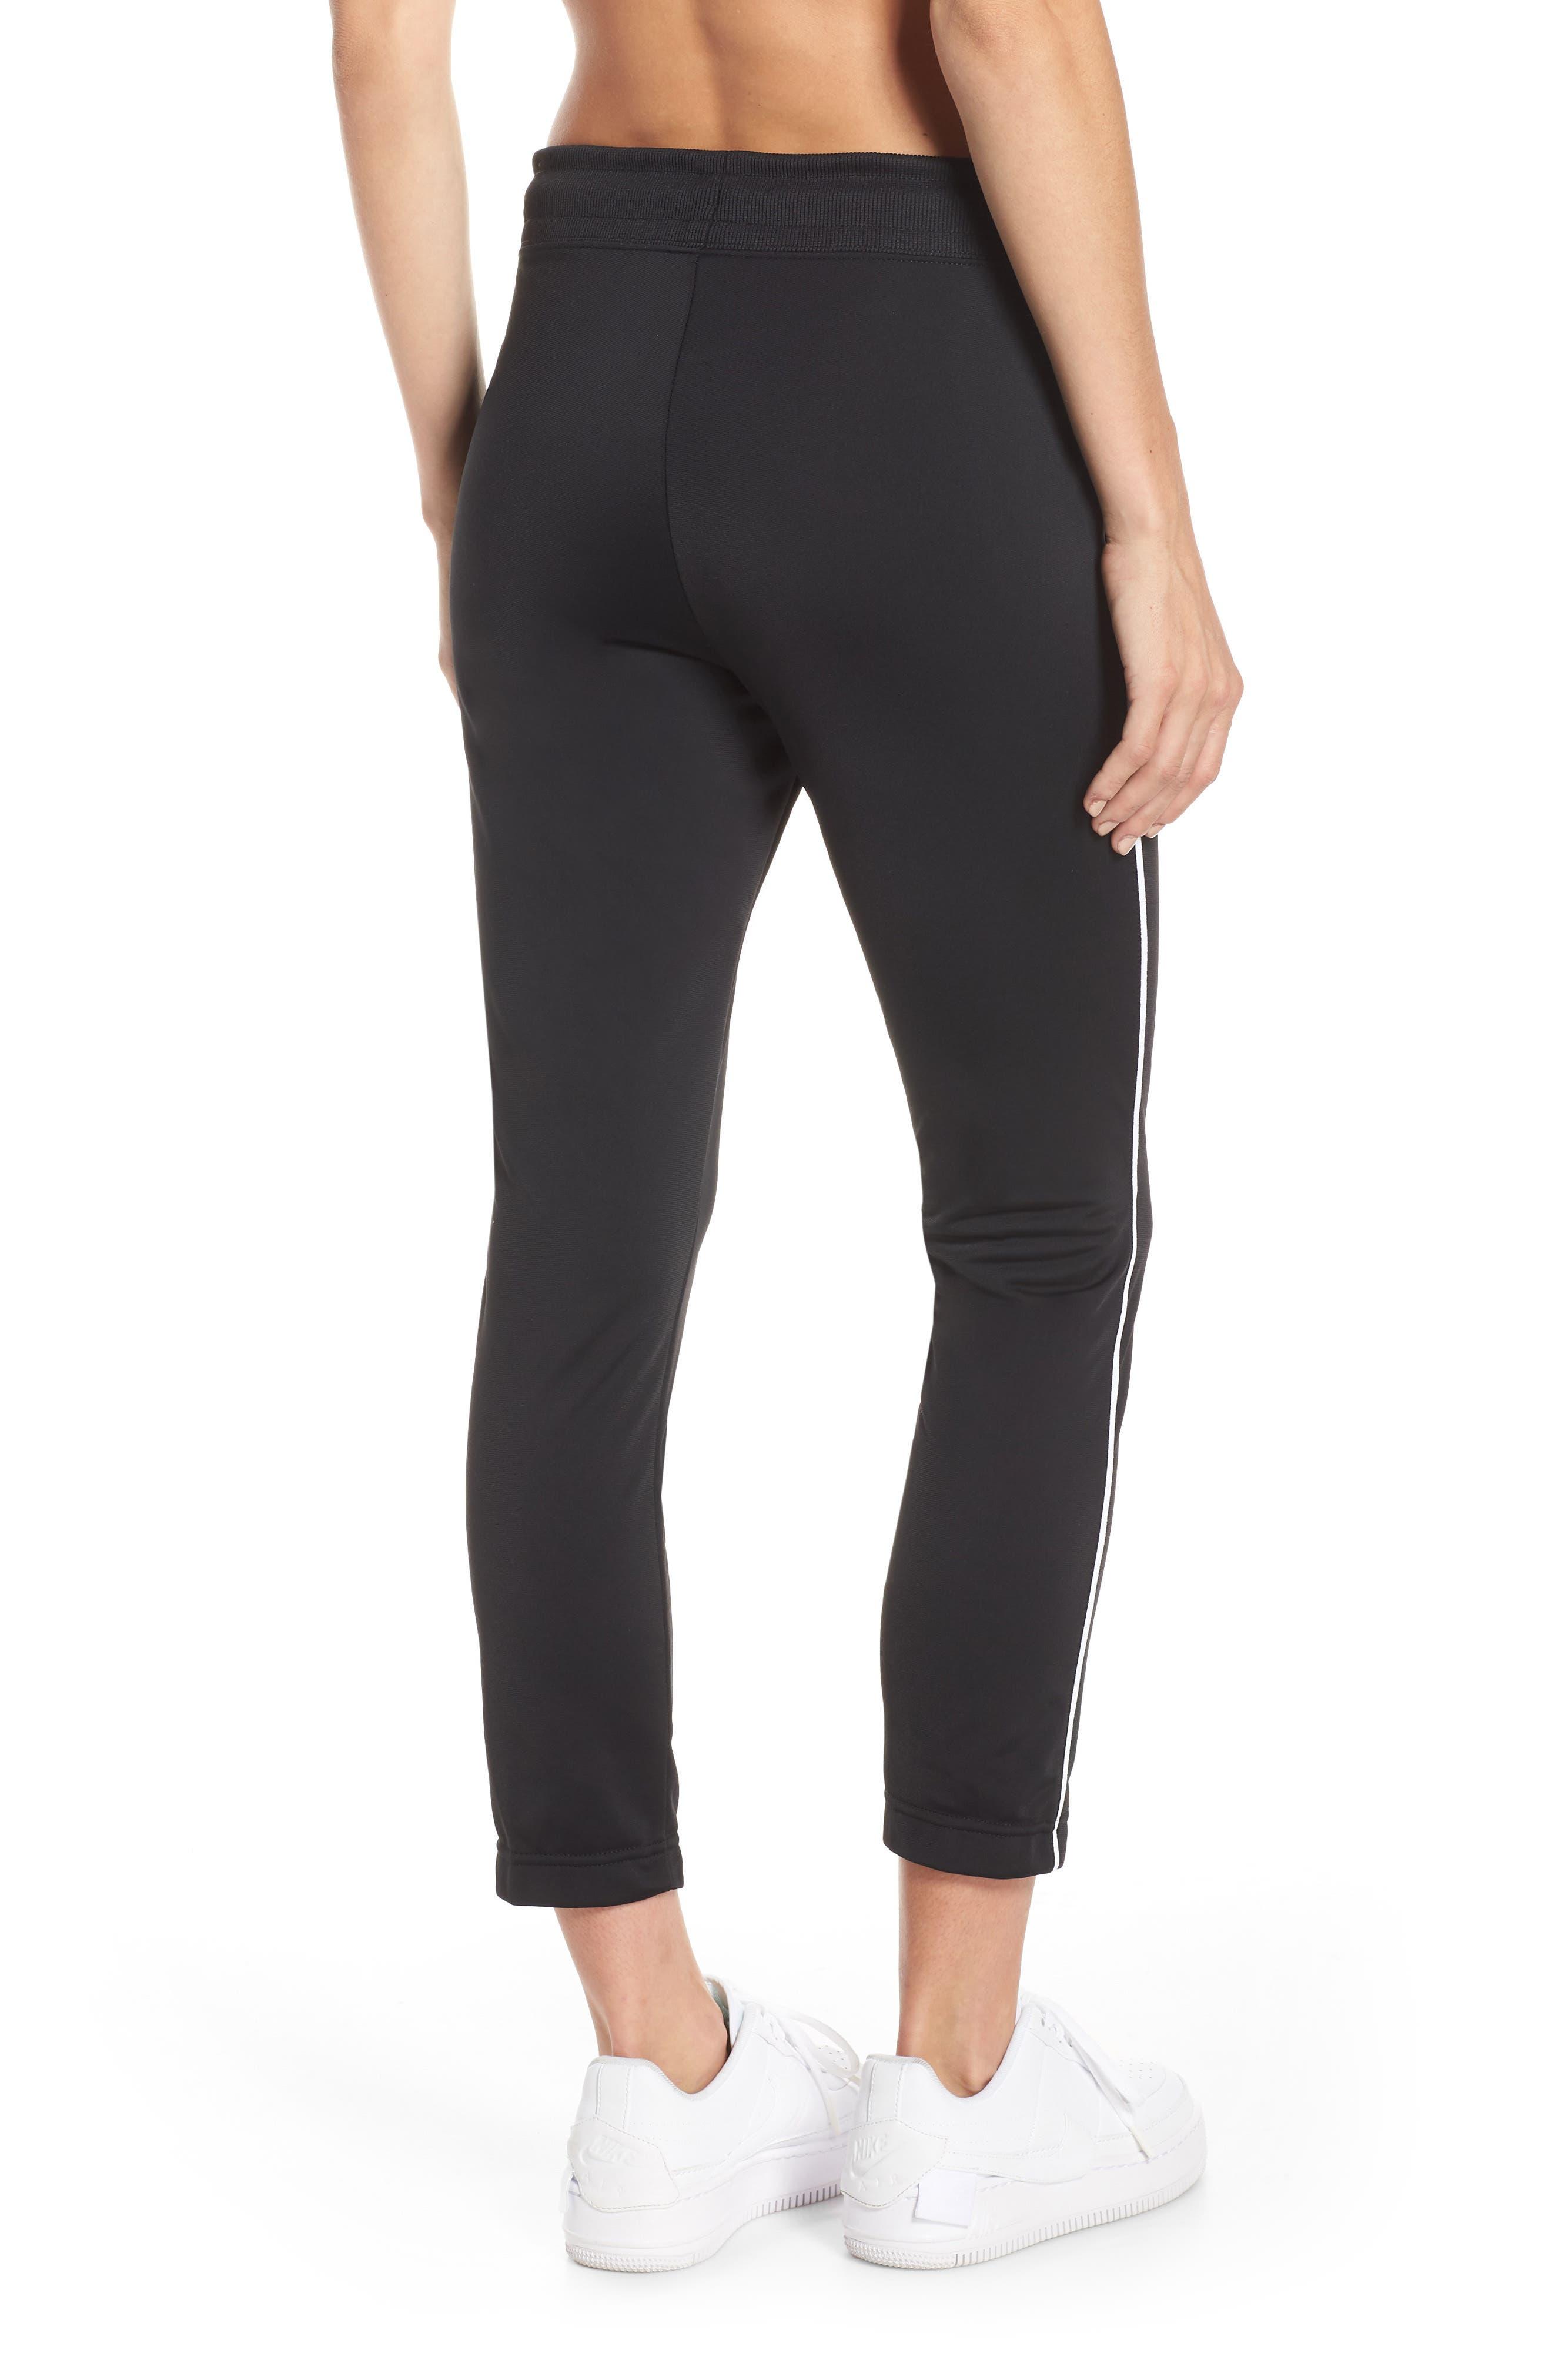 NIKE, NSW Slim Crop Pants, Alternate thumbnail 2, color, BLACK/ WHITE/ WHITE